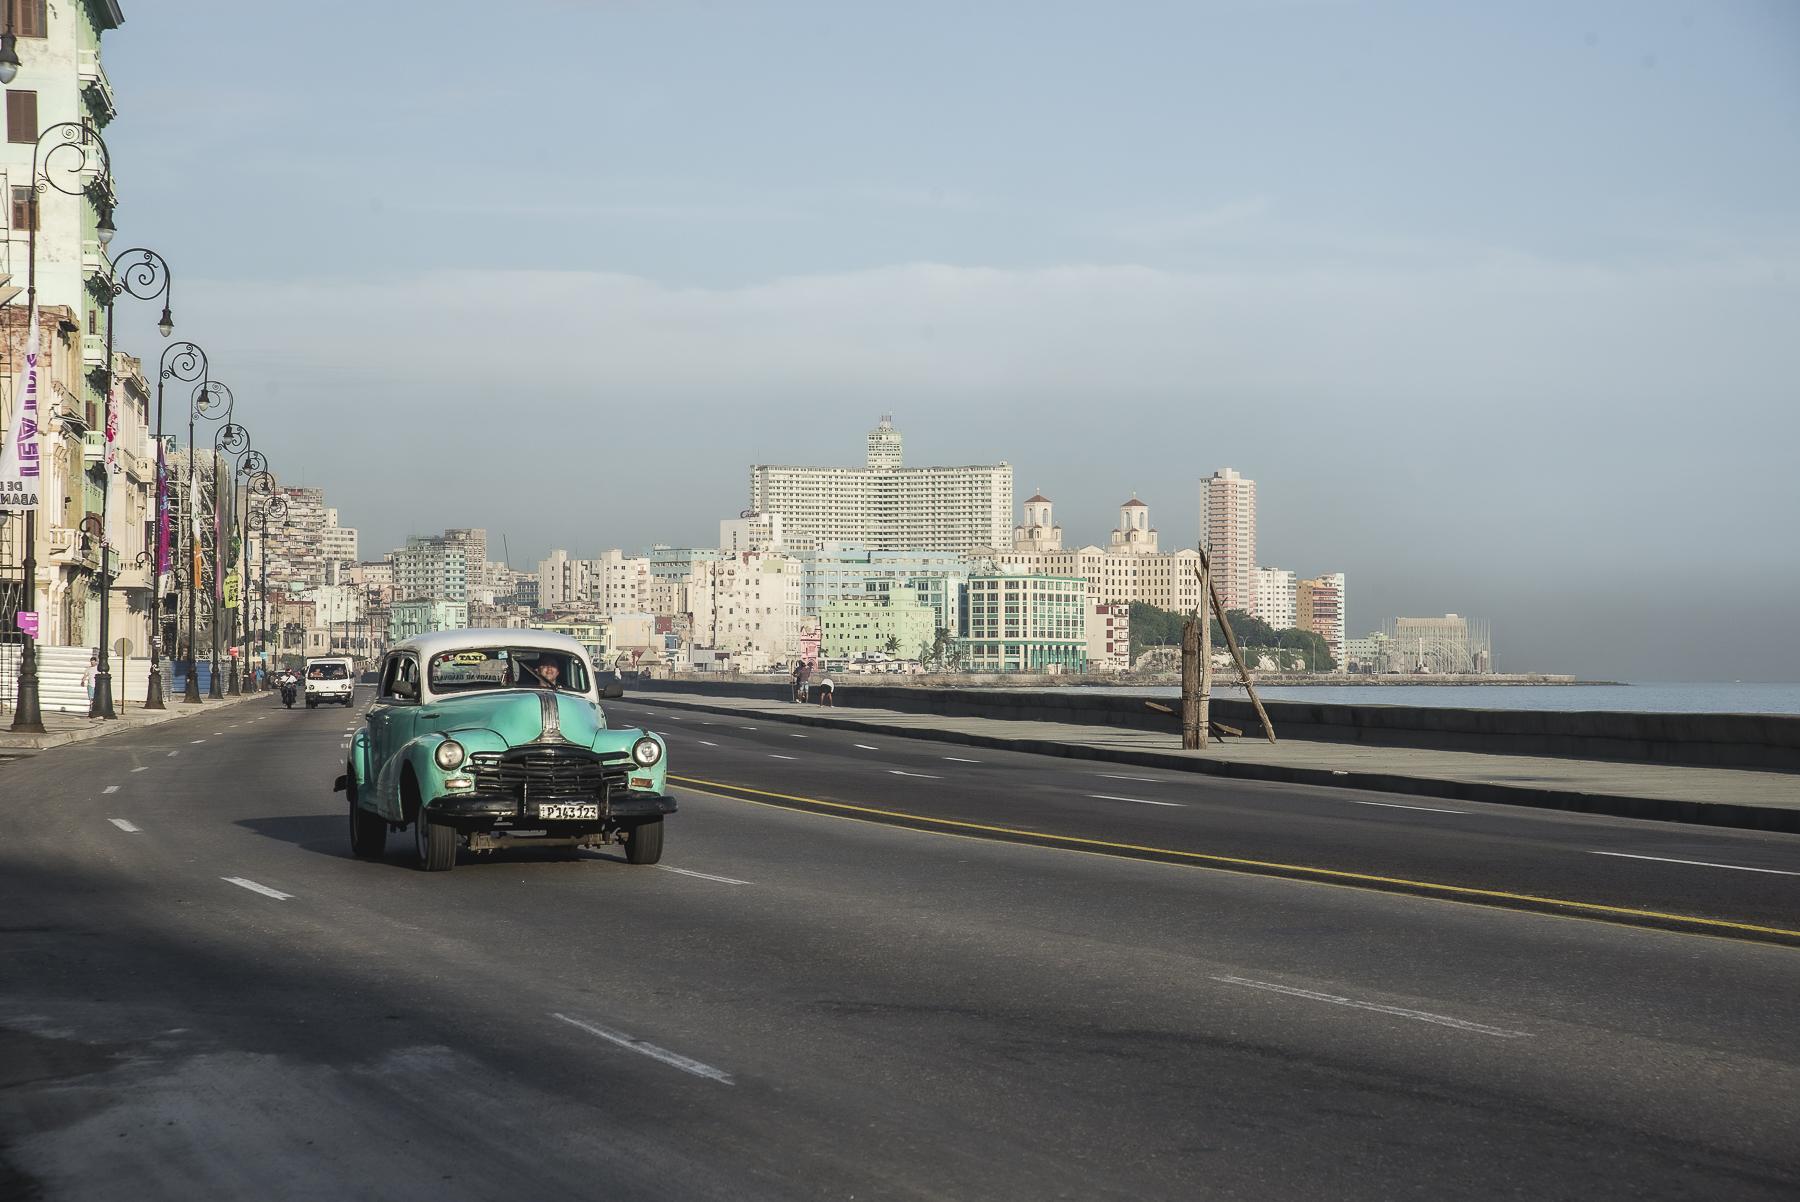 La Habana, Cuba / Zaragoza Walkers /streetphoto, fotografía callejera